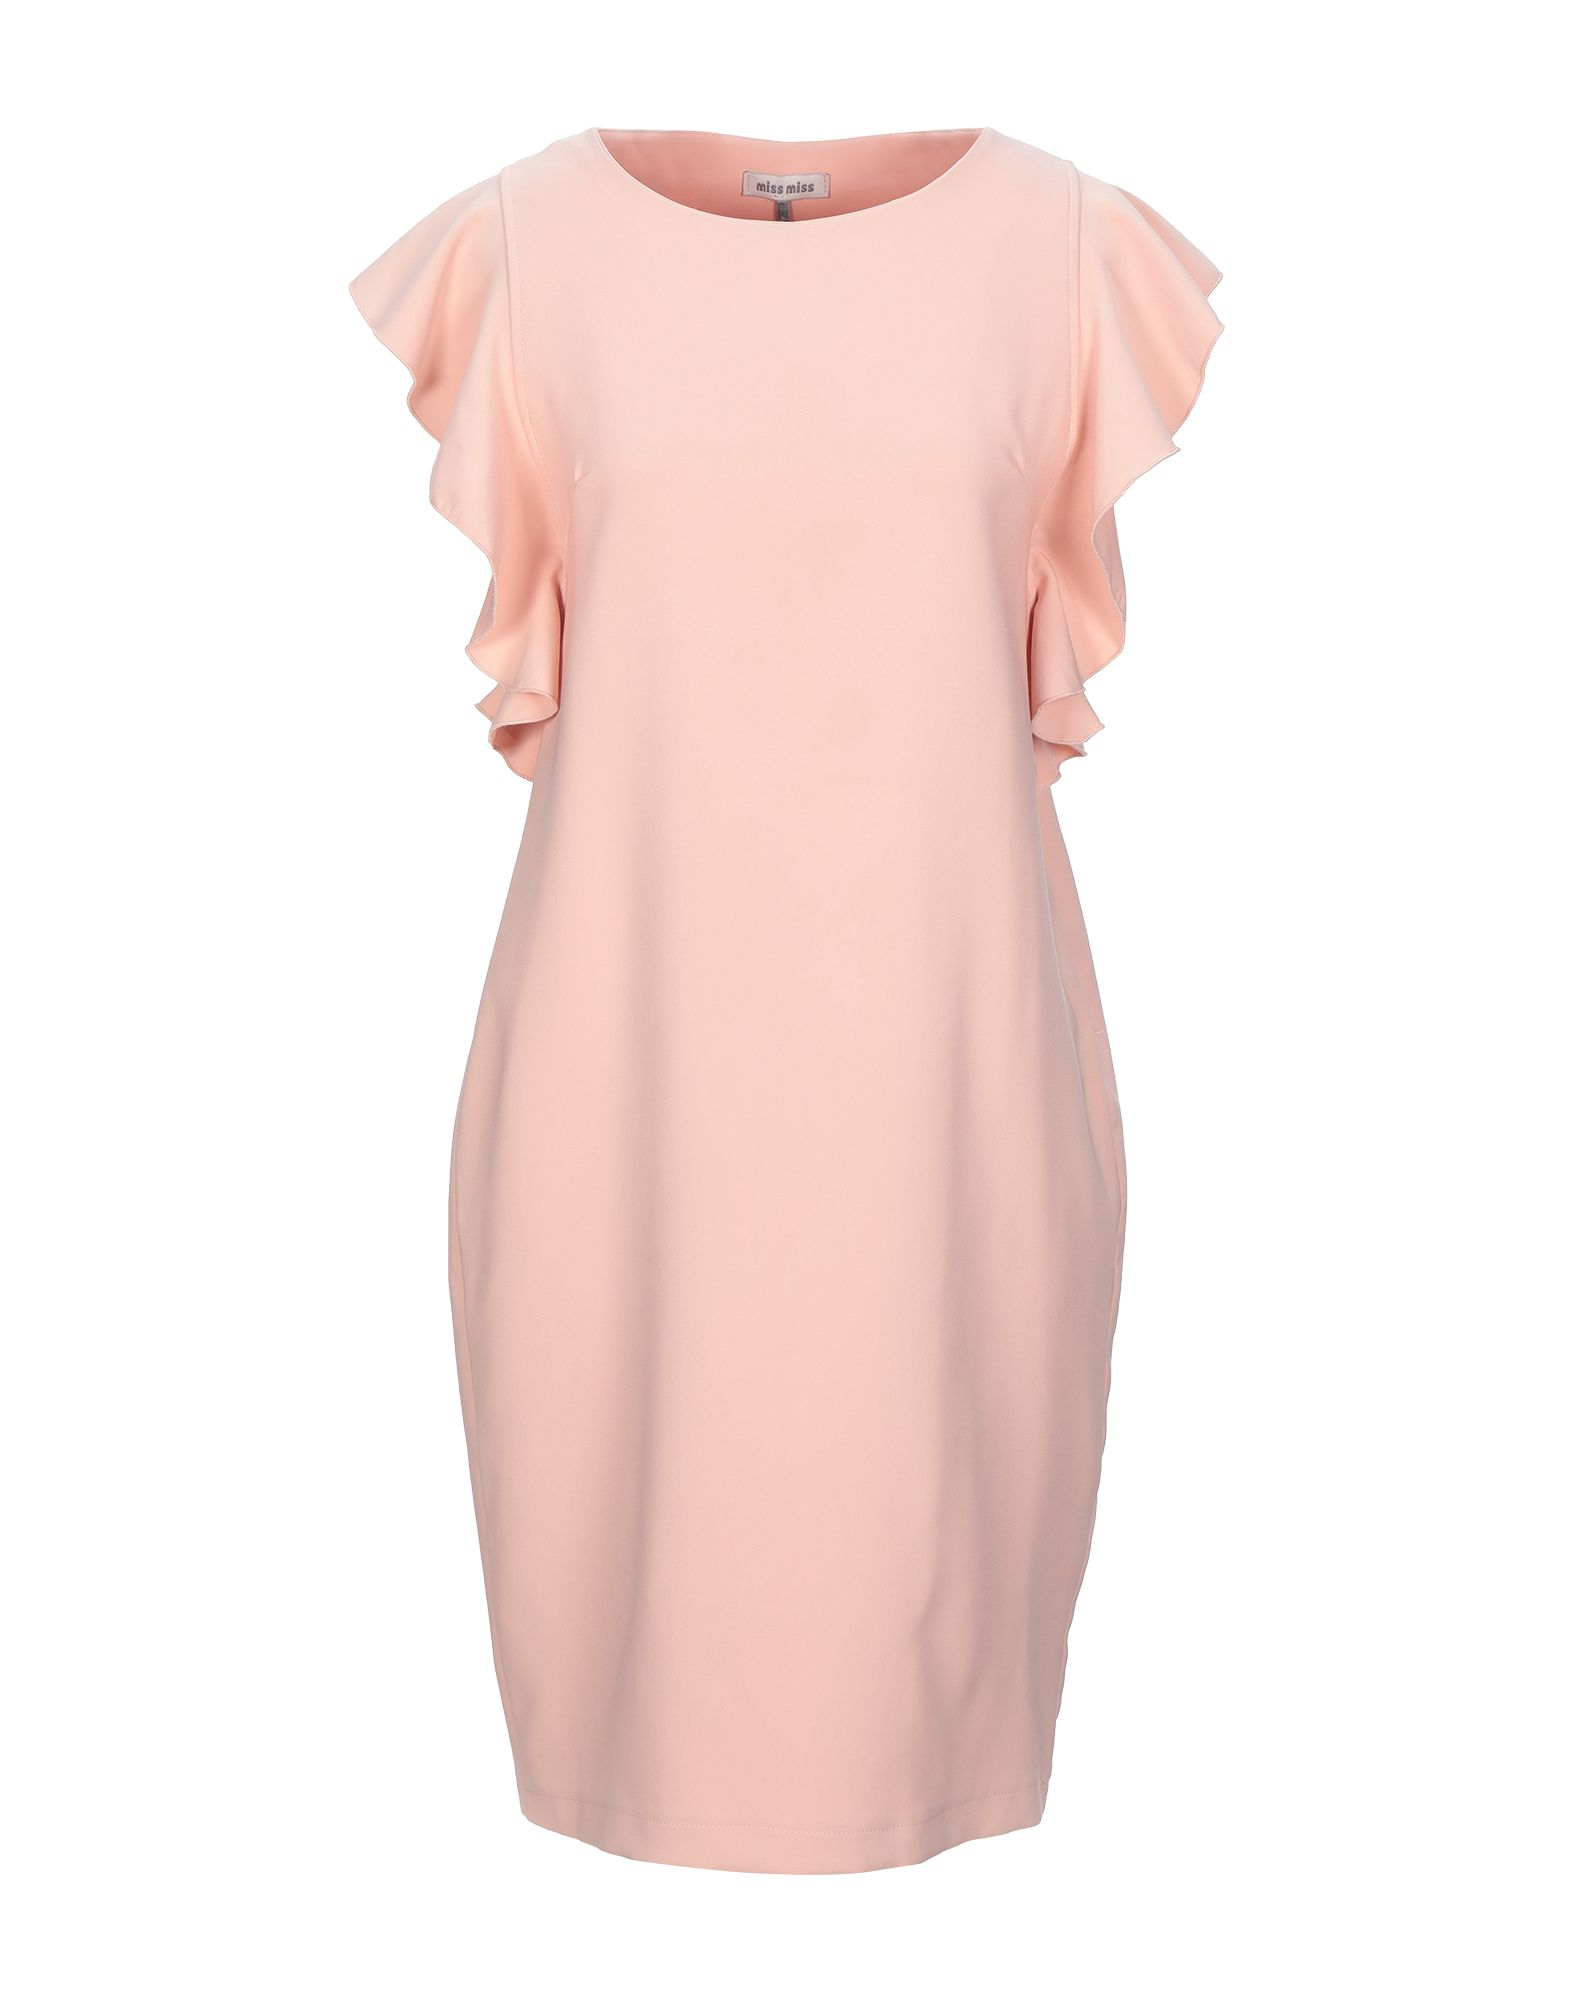 MISS MISS Короткое платье топ miss selfridge miss selfridge mi035ewfpcy3